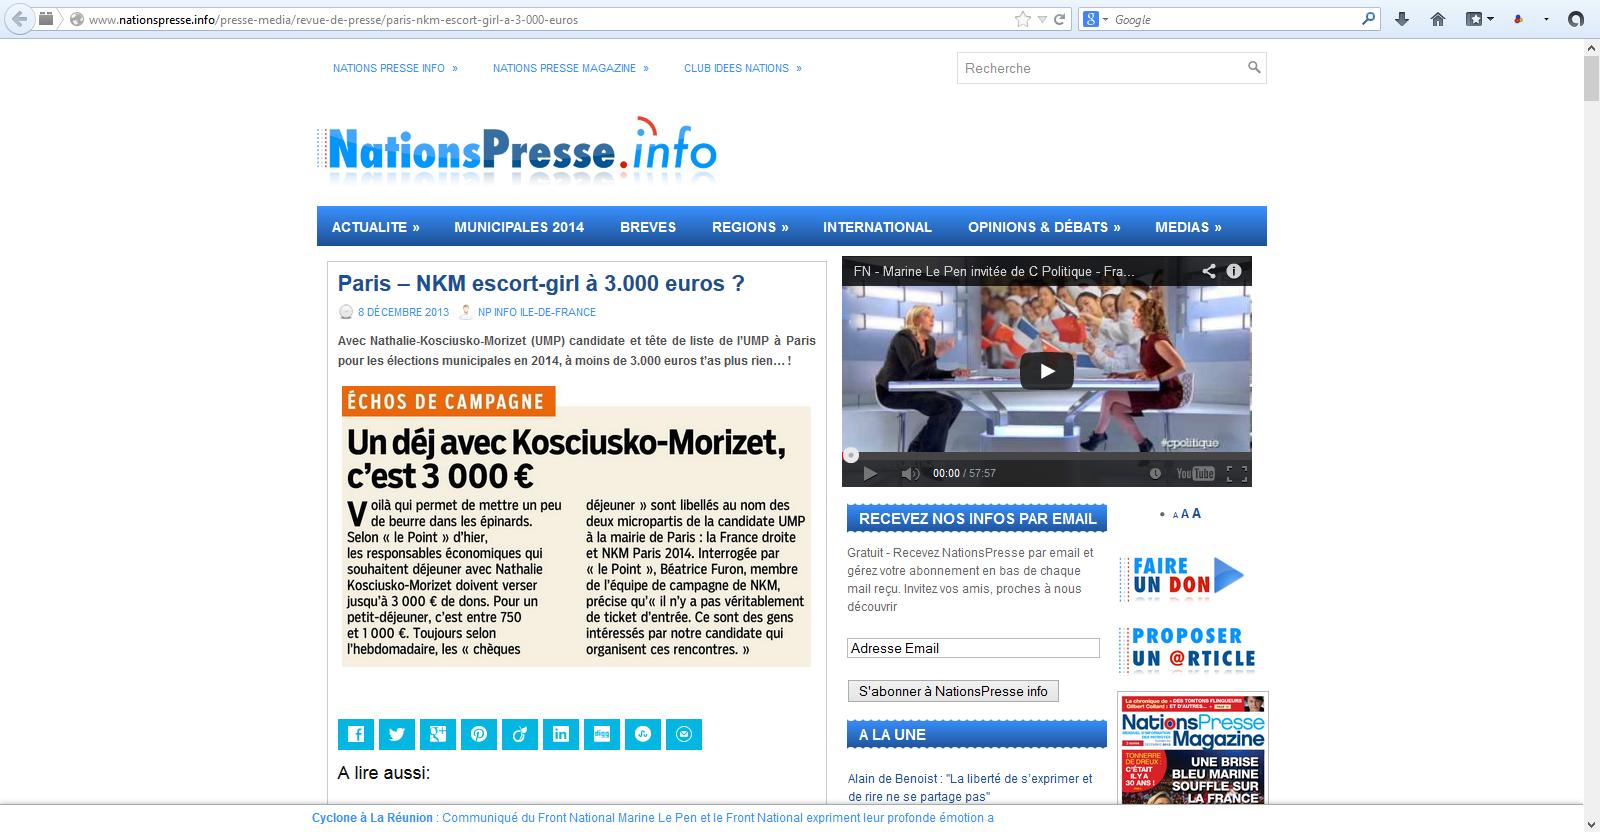 Nationspresse-NKM-escort-girl